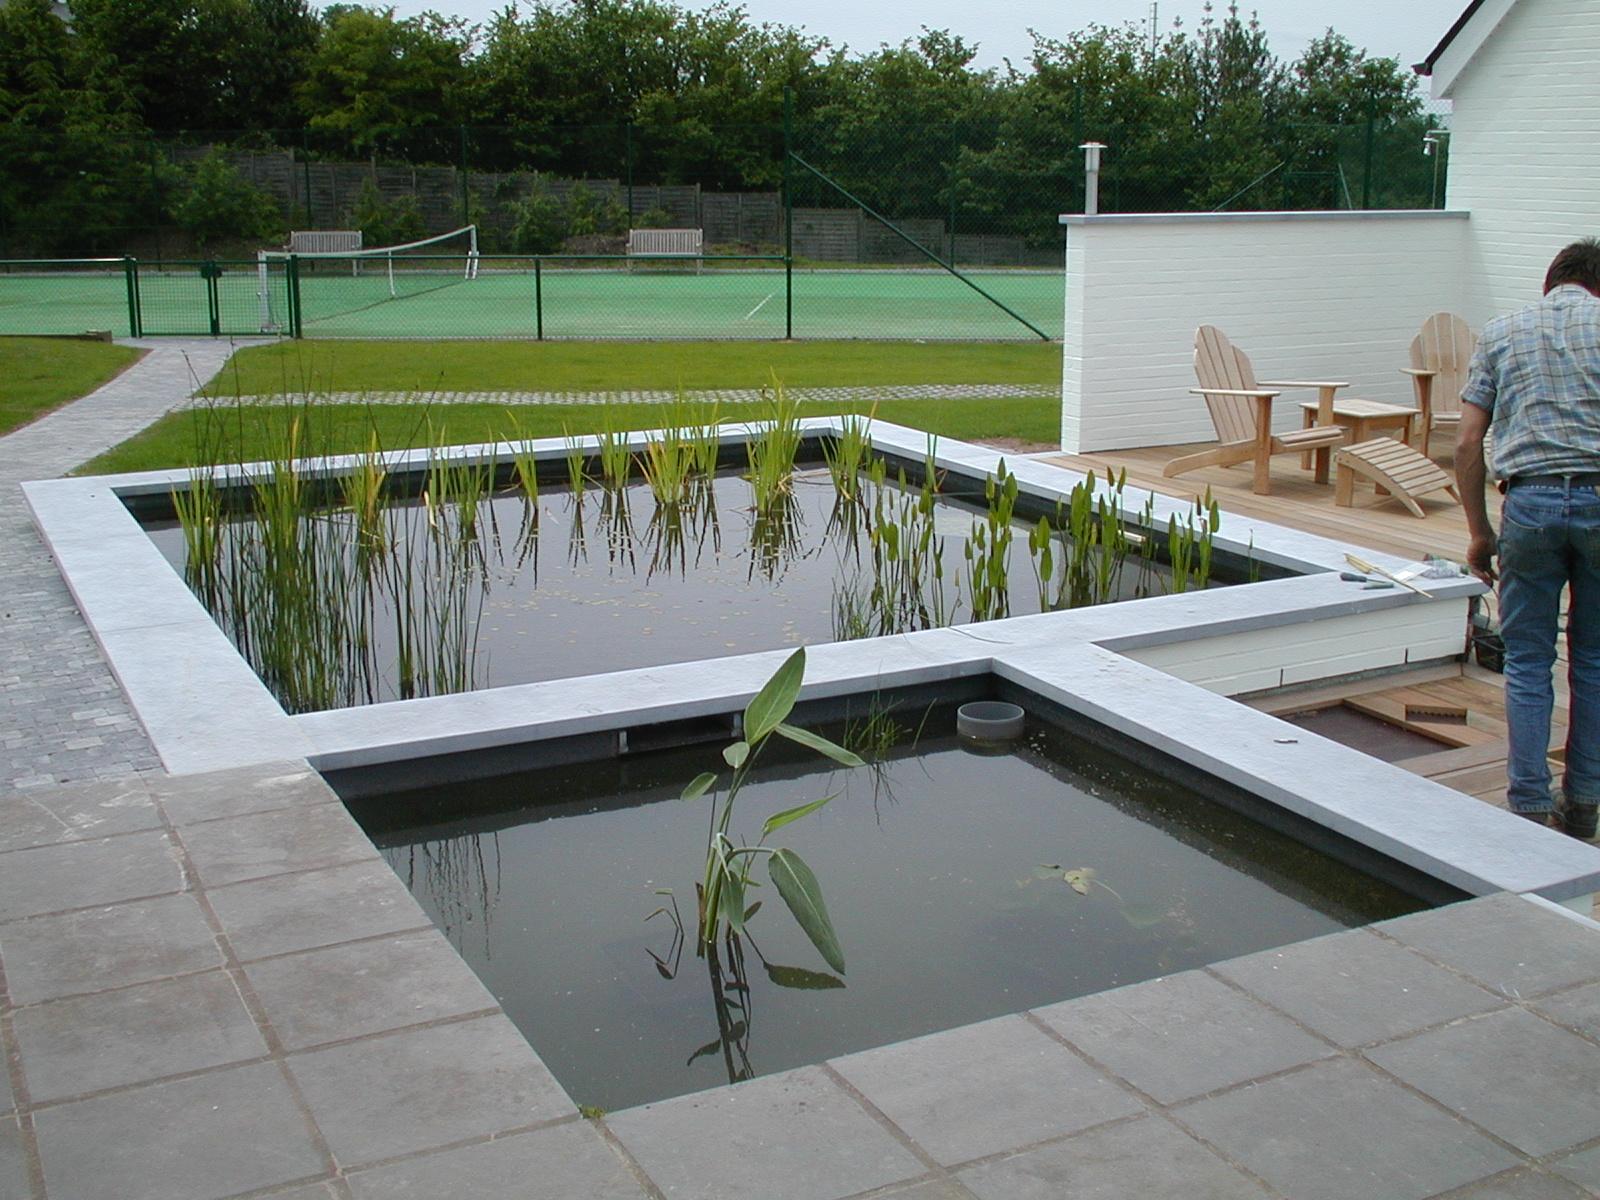 piscine d eau naturelle aquatic design concept et garden. Black Bedroom Furniture Sets. Home Design Ideas